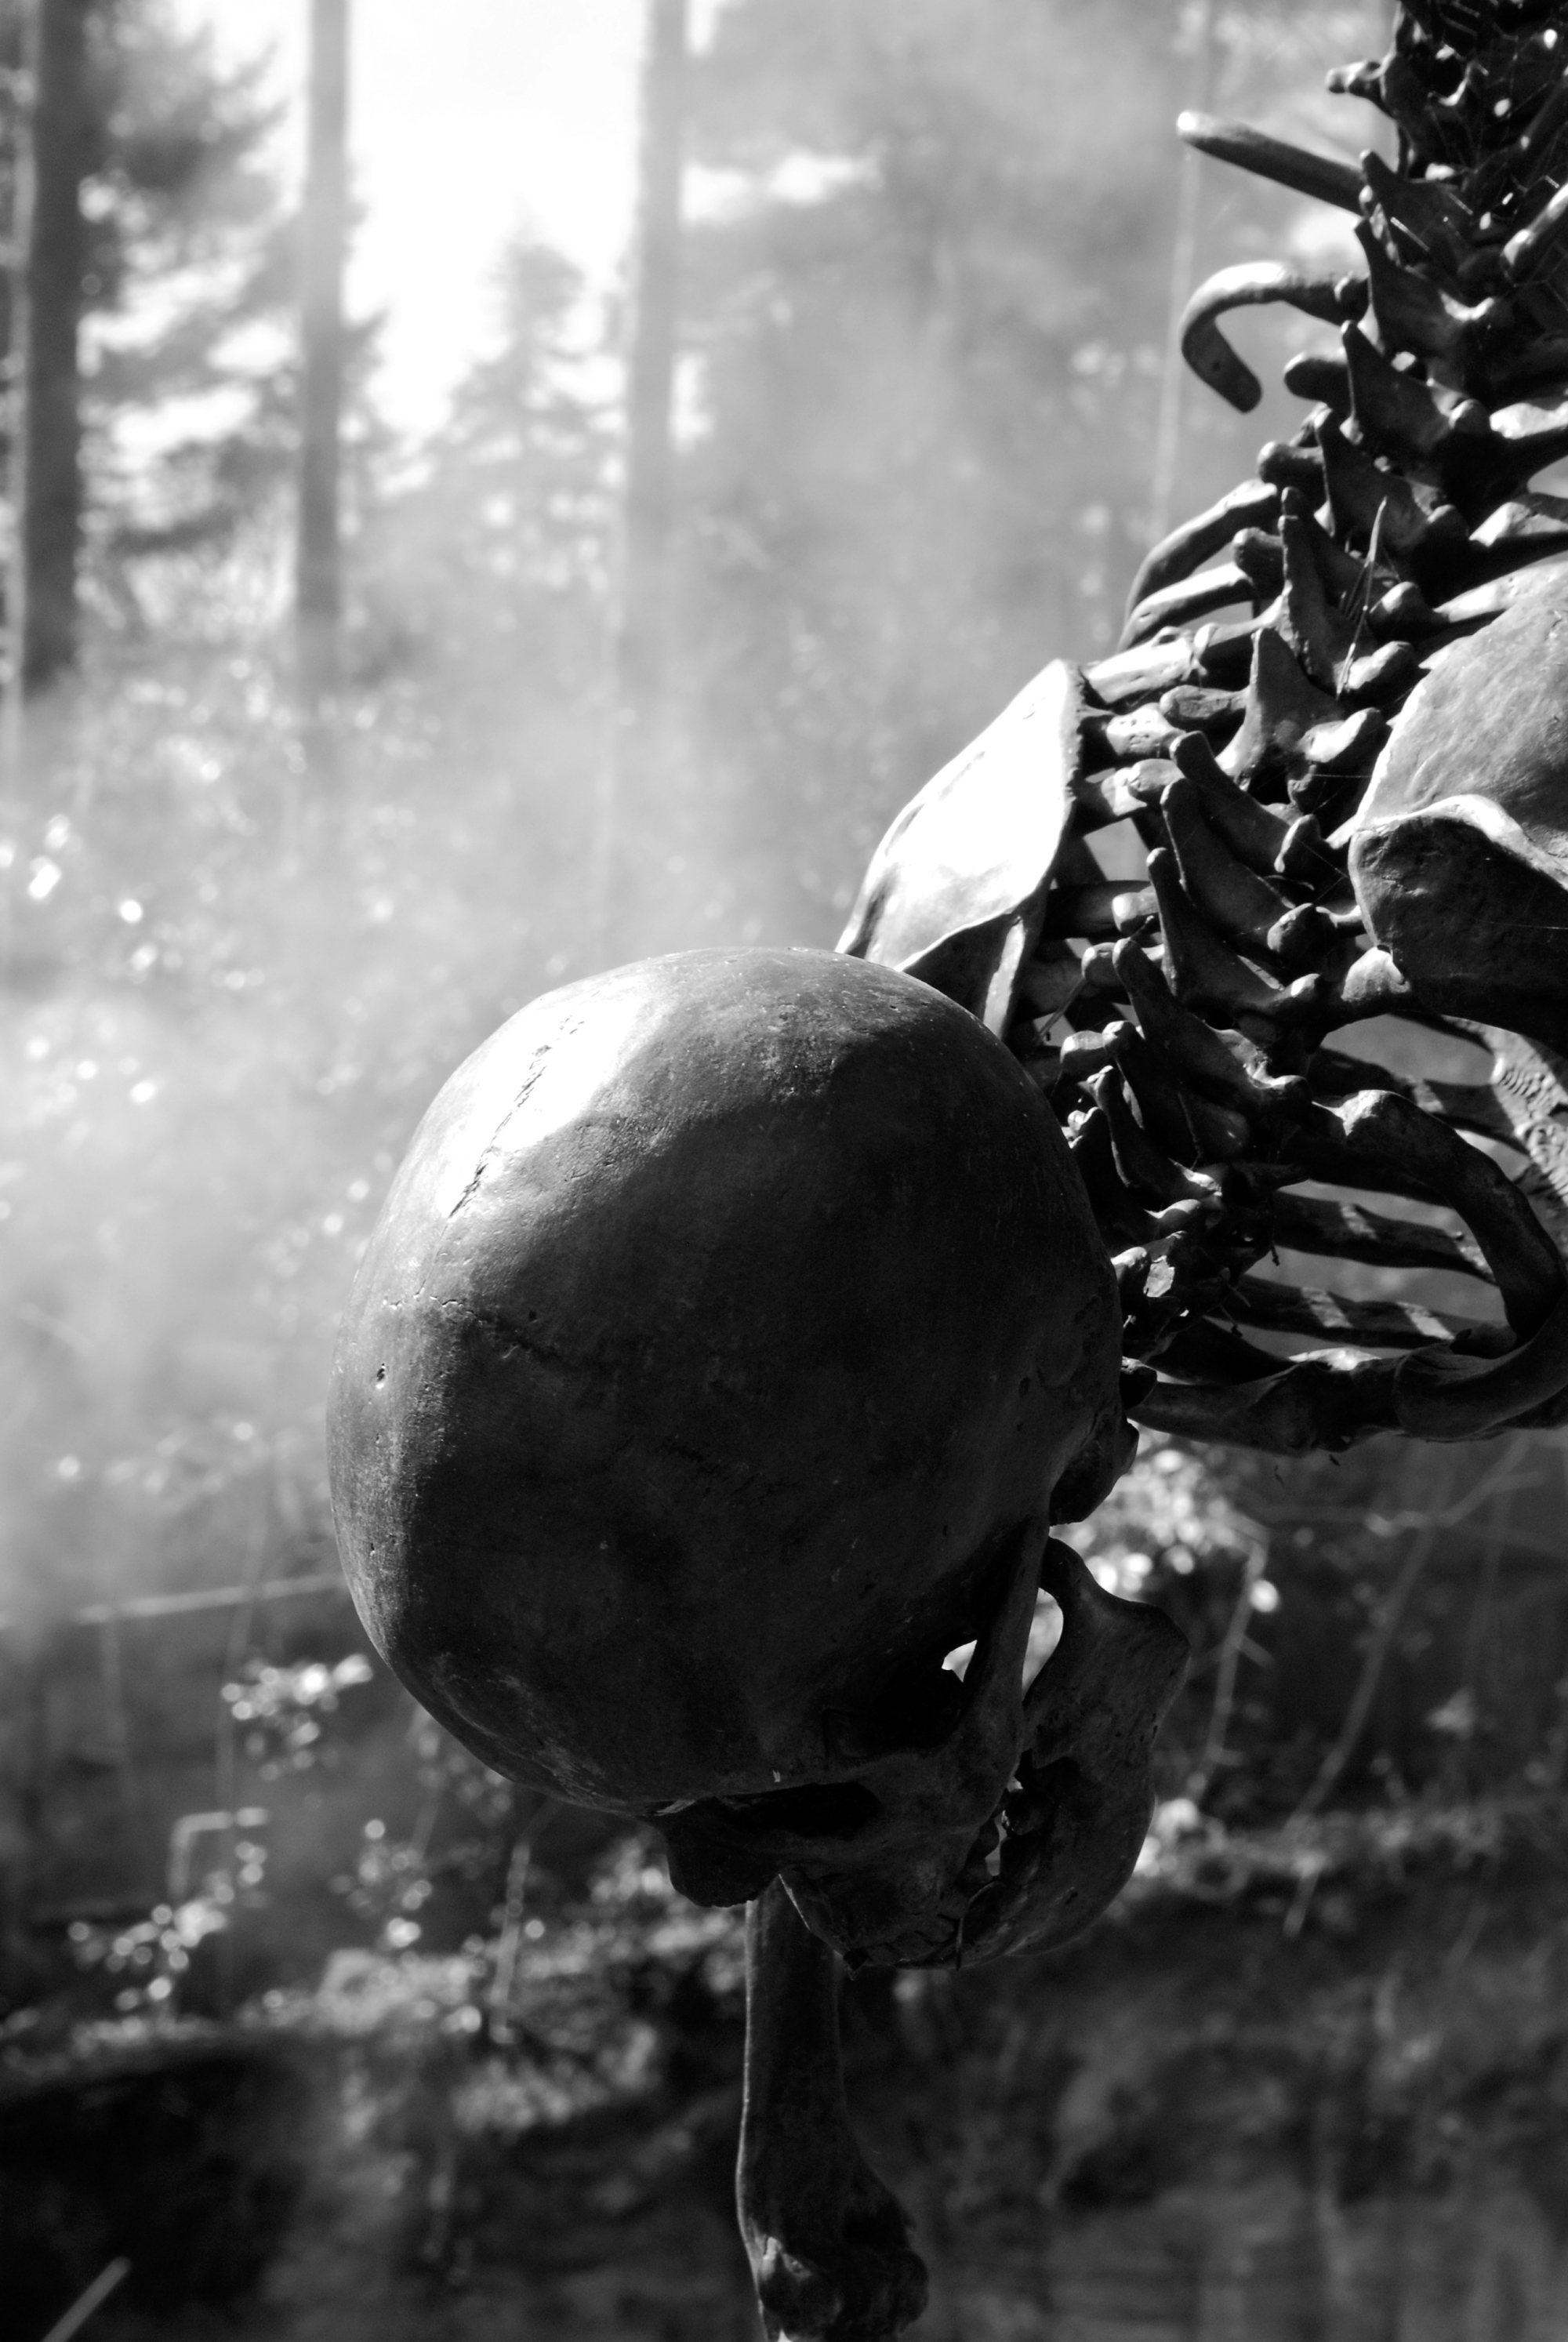 Playful Death